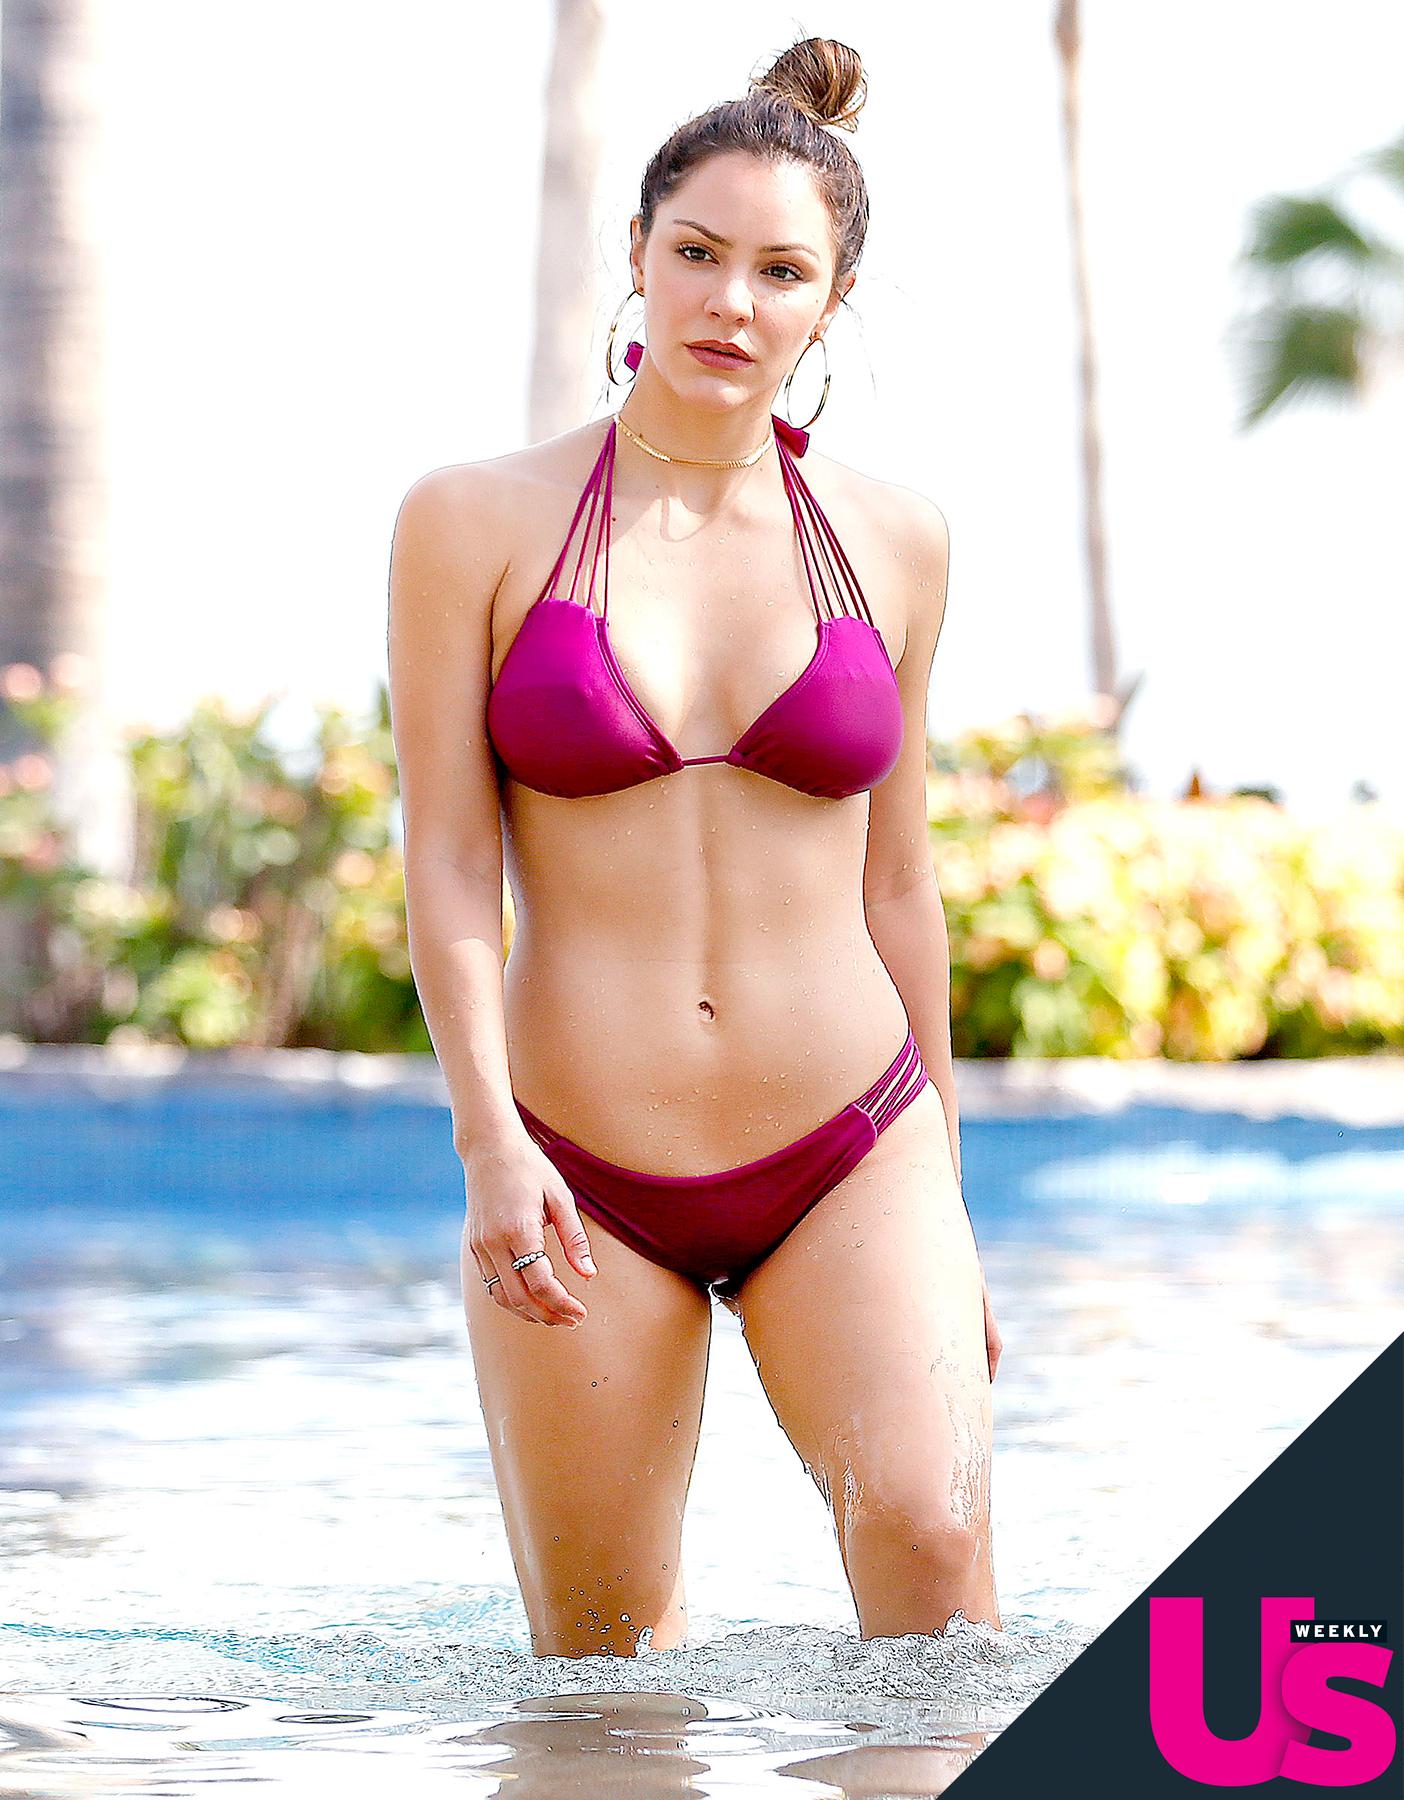 Quentin de briey,Kaitlyn bristowe sexy 47 Photos Sex nude Alexandra Stan Hot. 2018-2019 celebrityes photos leaks!,Ela rose naked